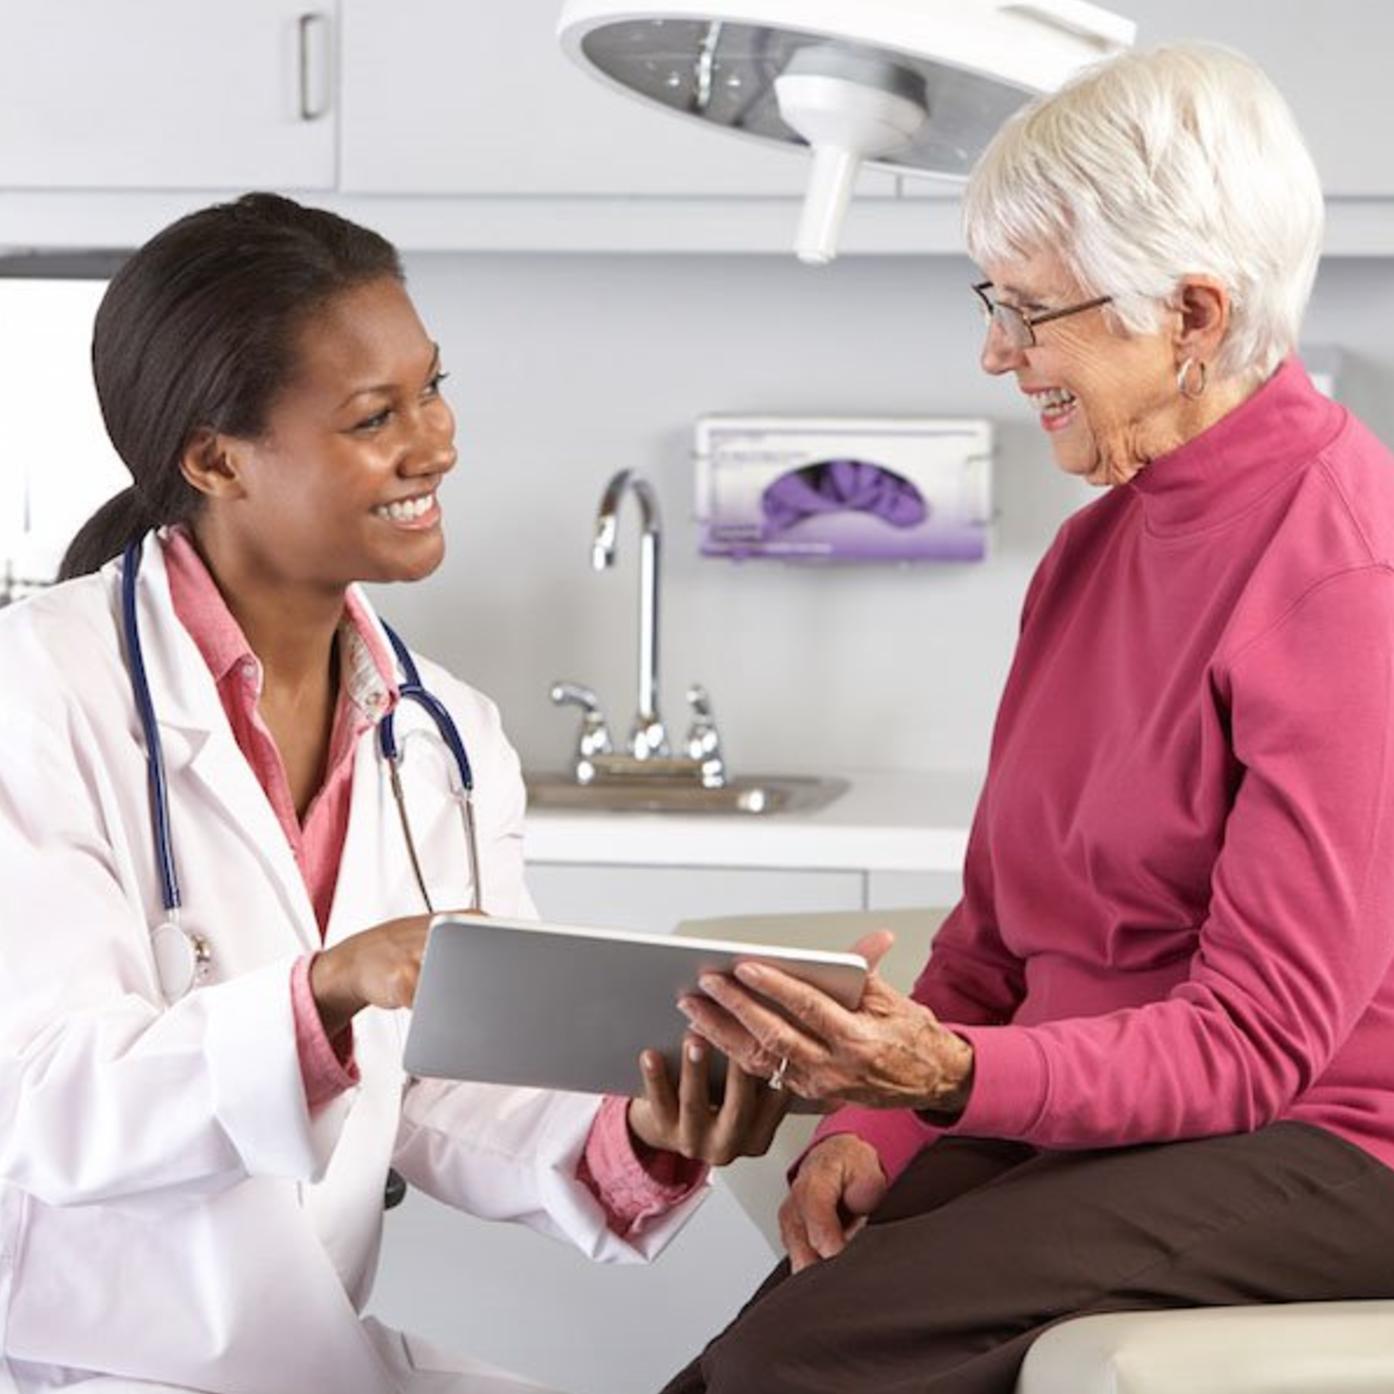 Is Health Informatics a good career choice